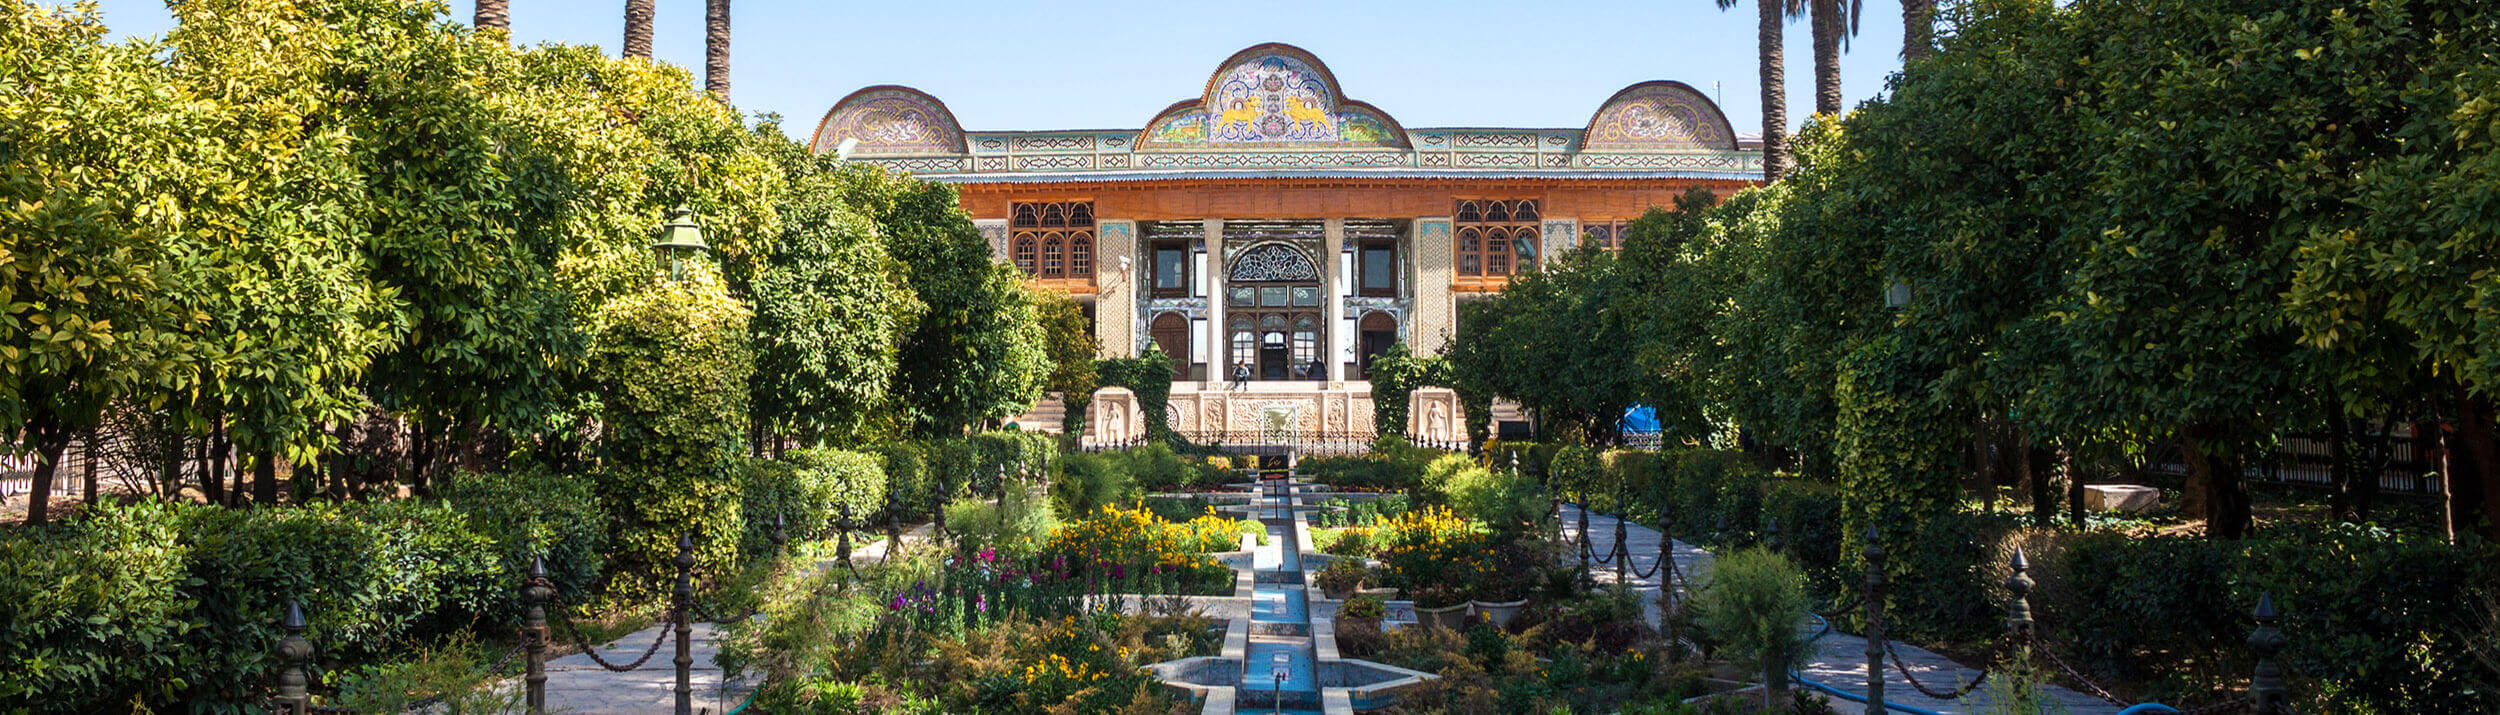 Jardines de Narenjestán